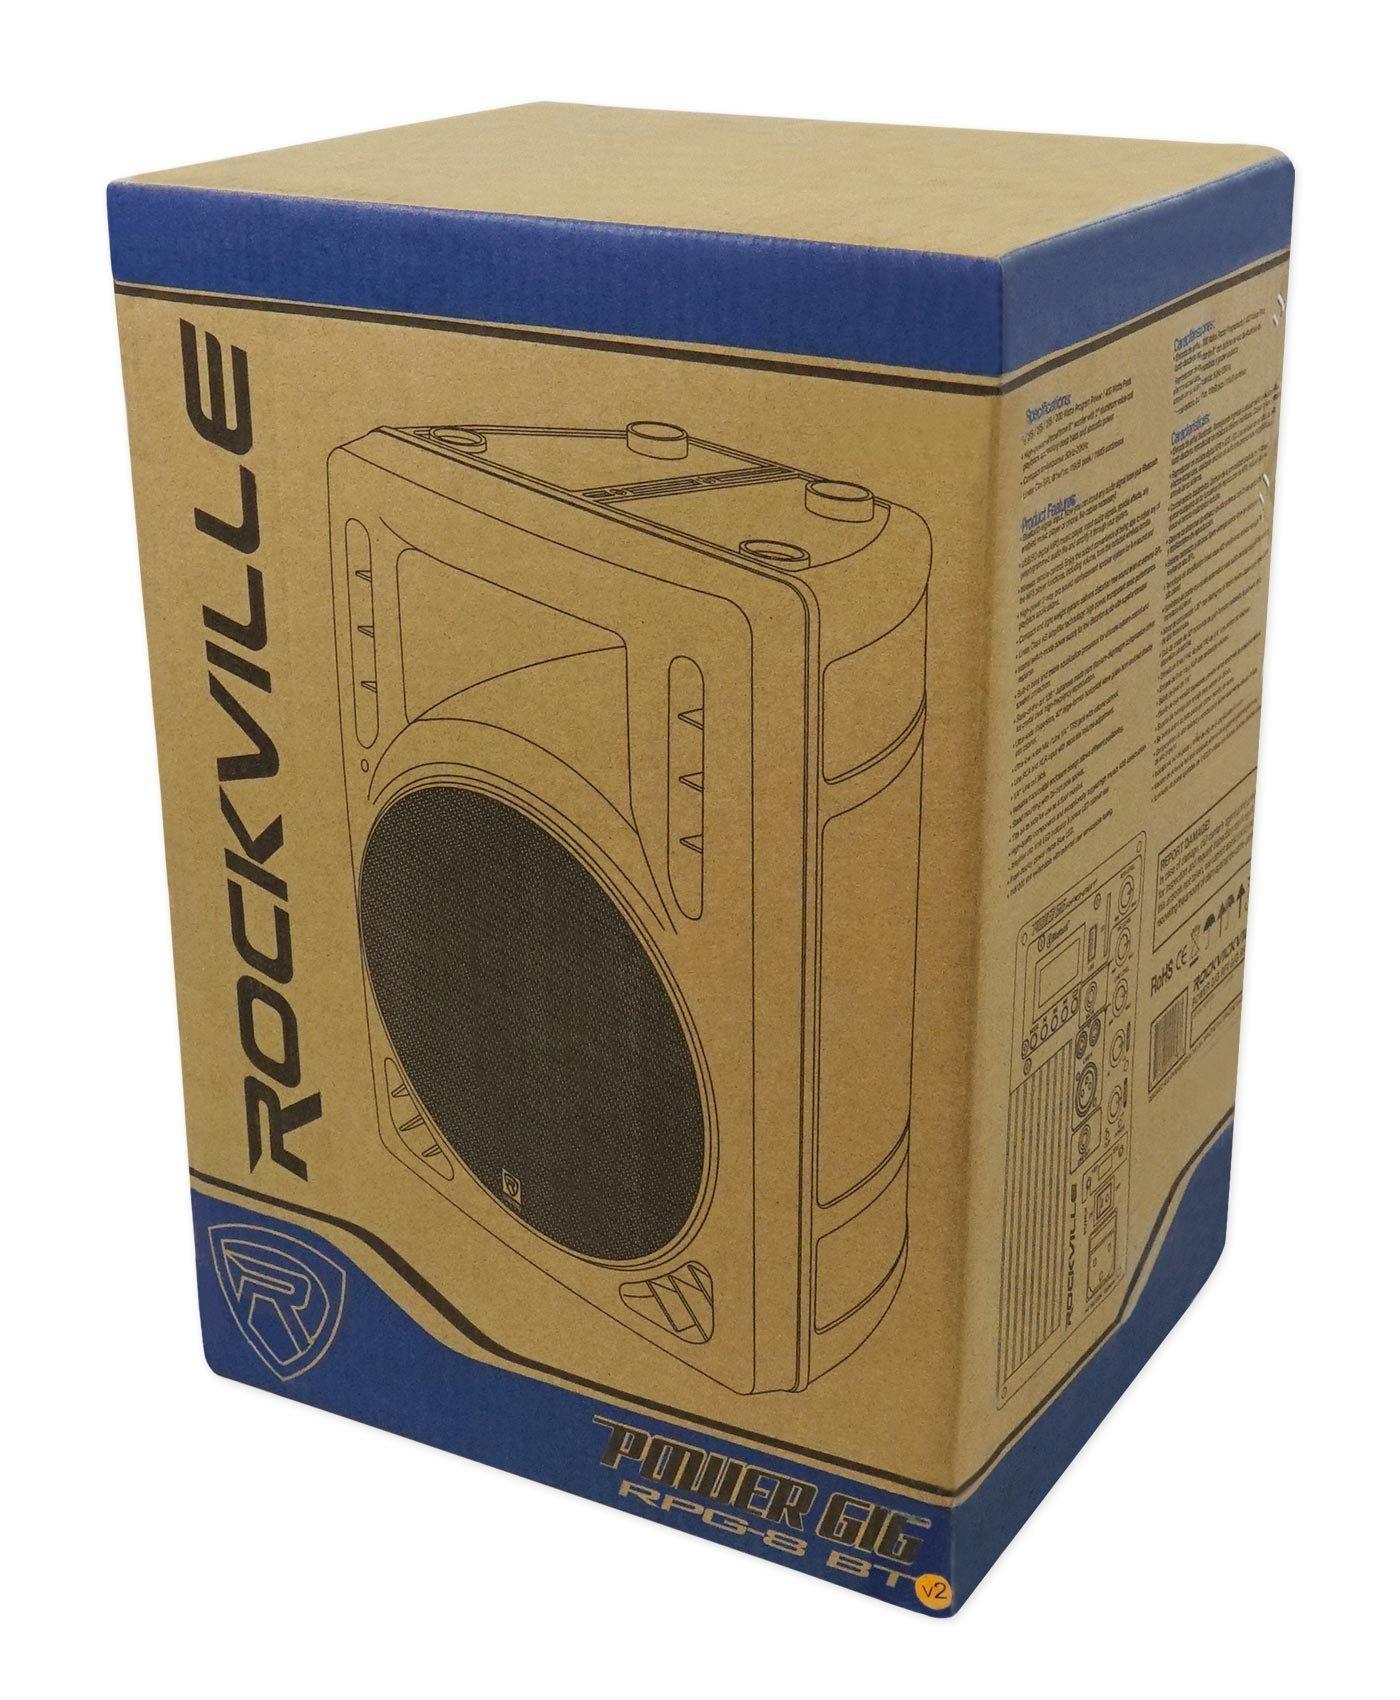 Rockville Bluetooth 8 Android/ipad/iphone/Laptop/TV Pro